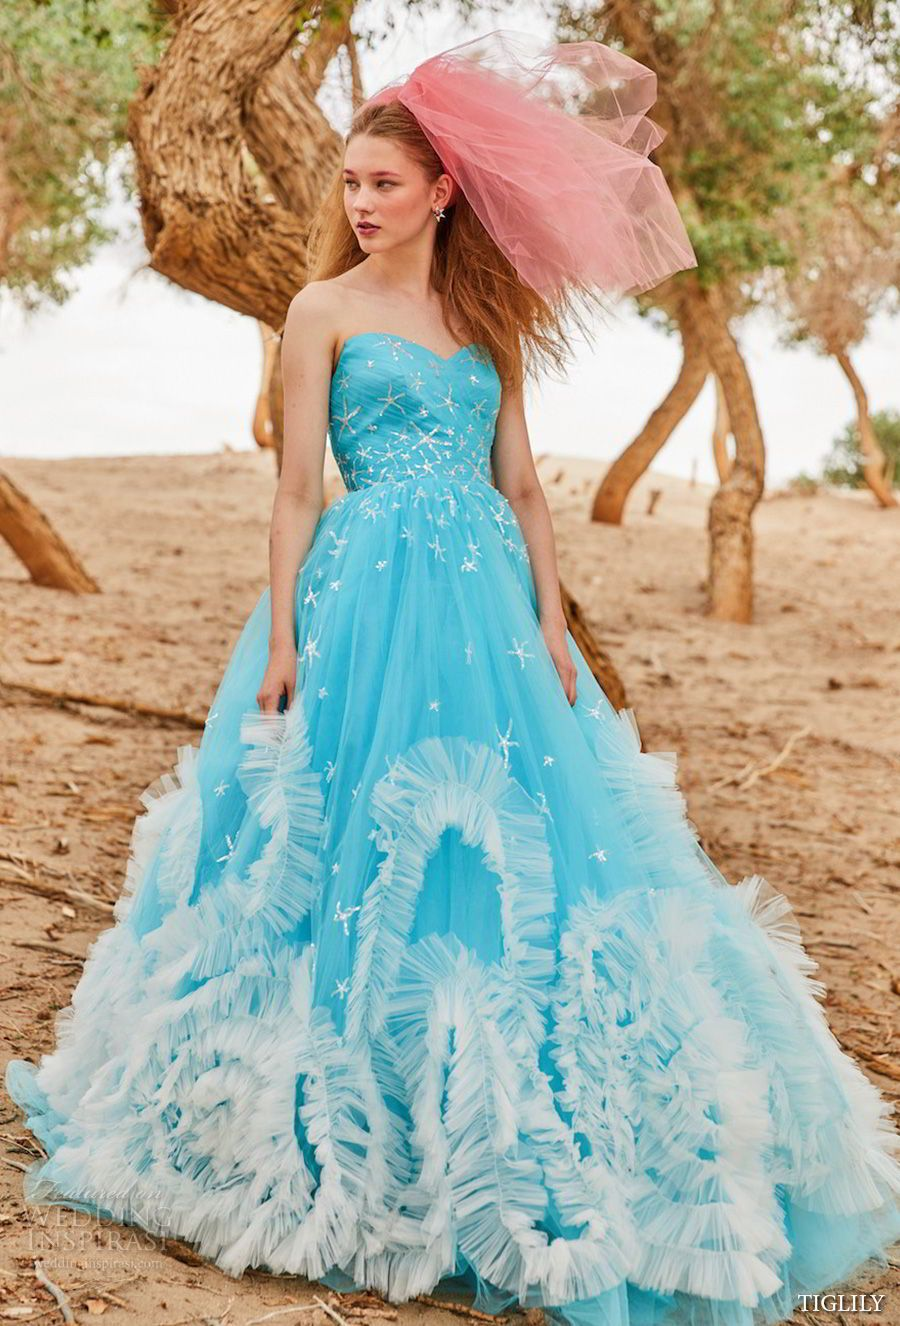 TIGLILY 2018 Wedding Dresses | Vestidos de novia de colores ...